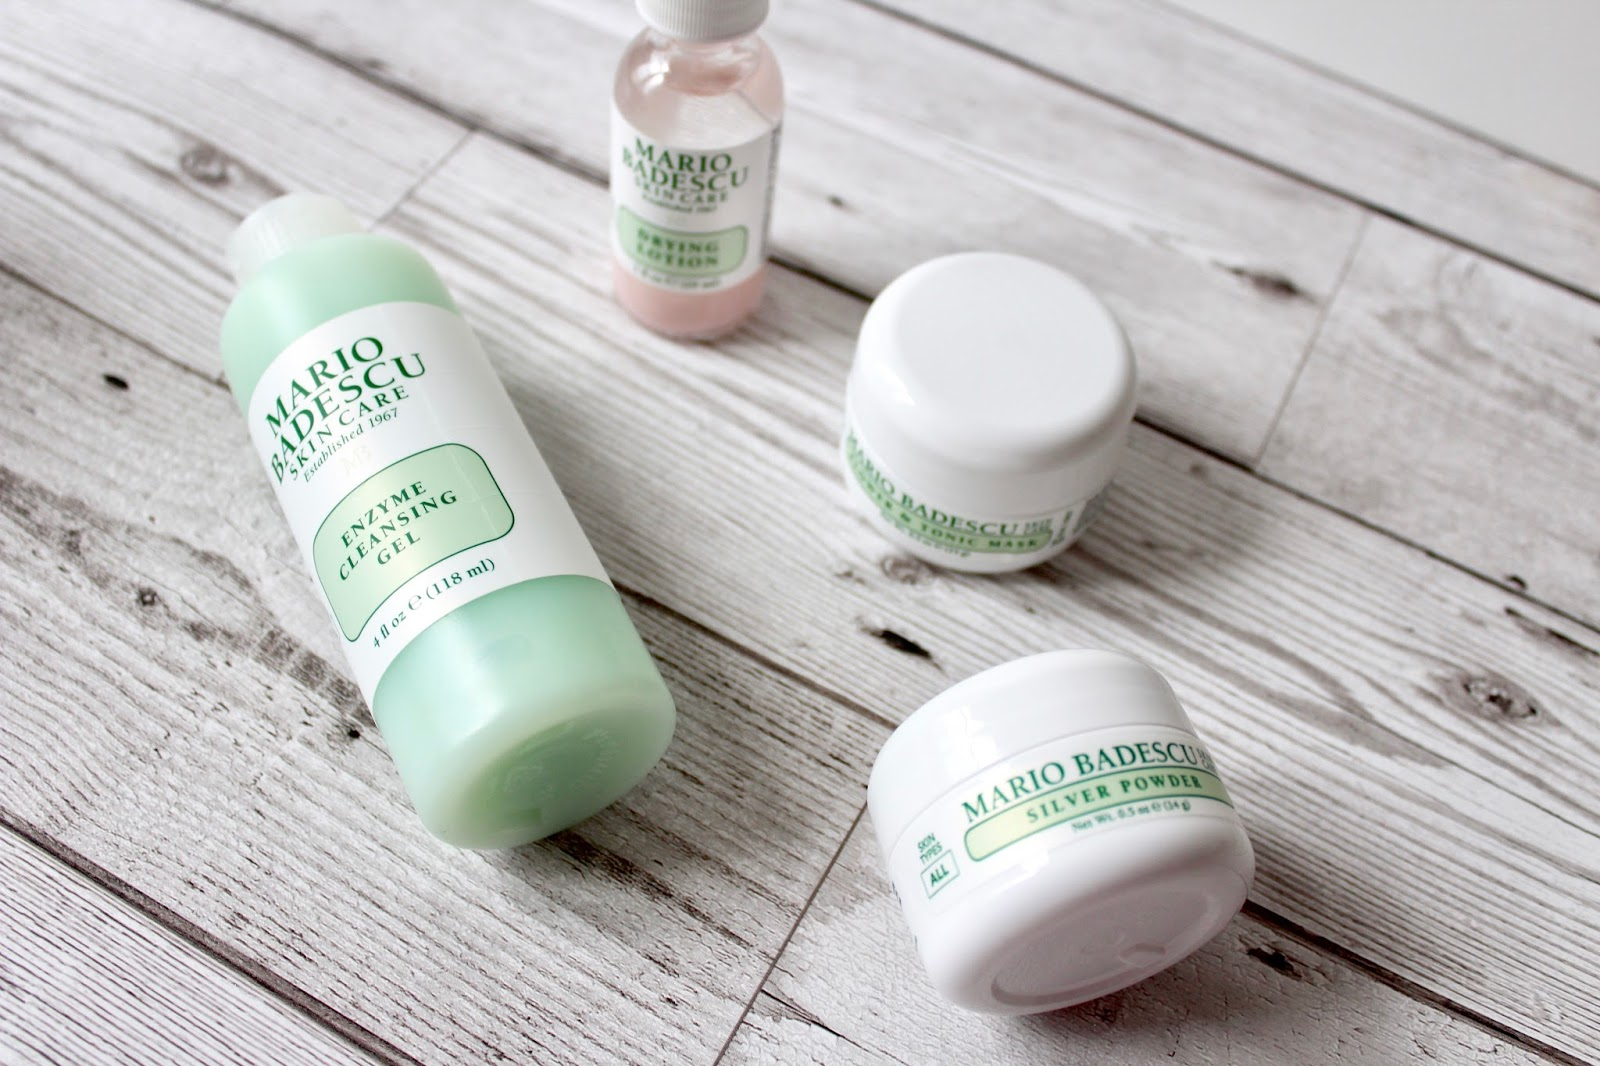 Mario Badescu Skincare: First Impressions